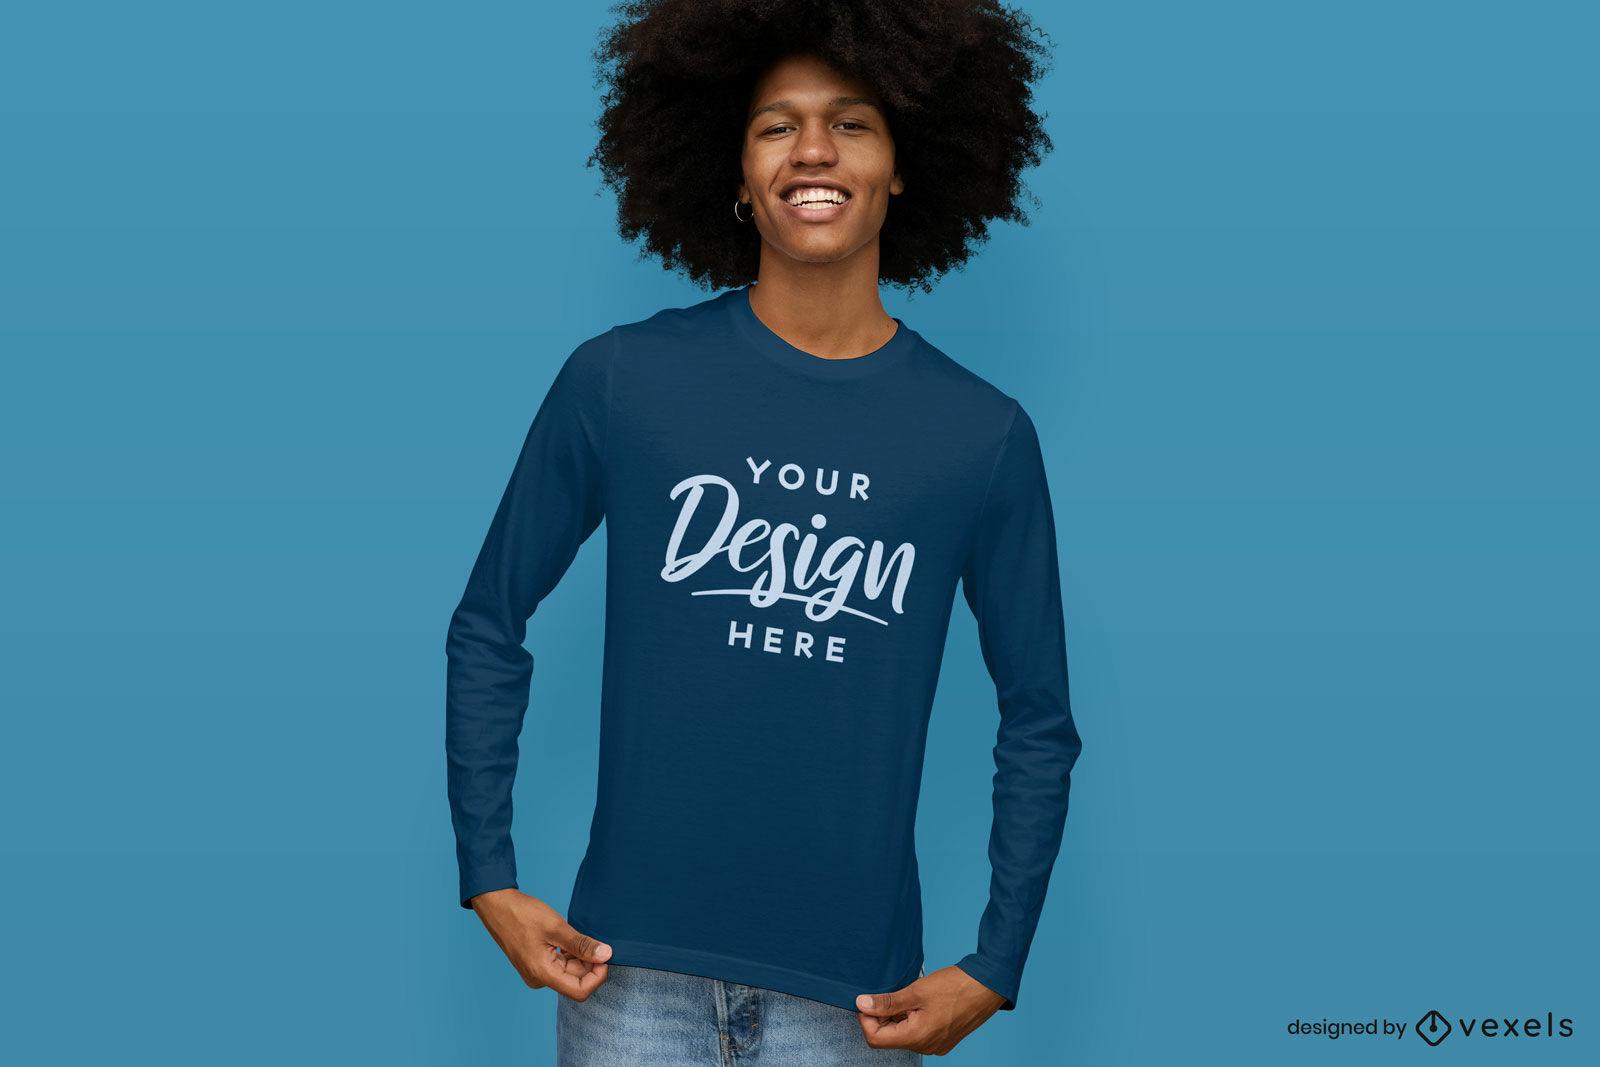 Blue long sleeve t-shirt mockup blue background